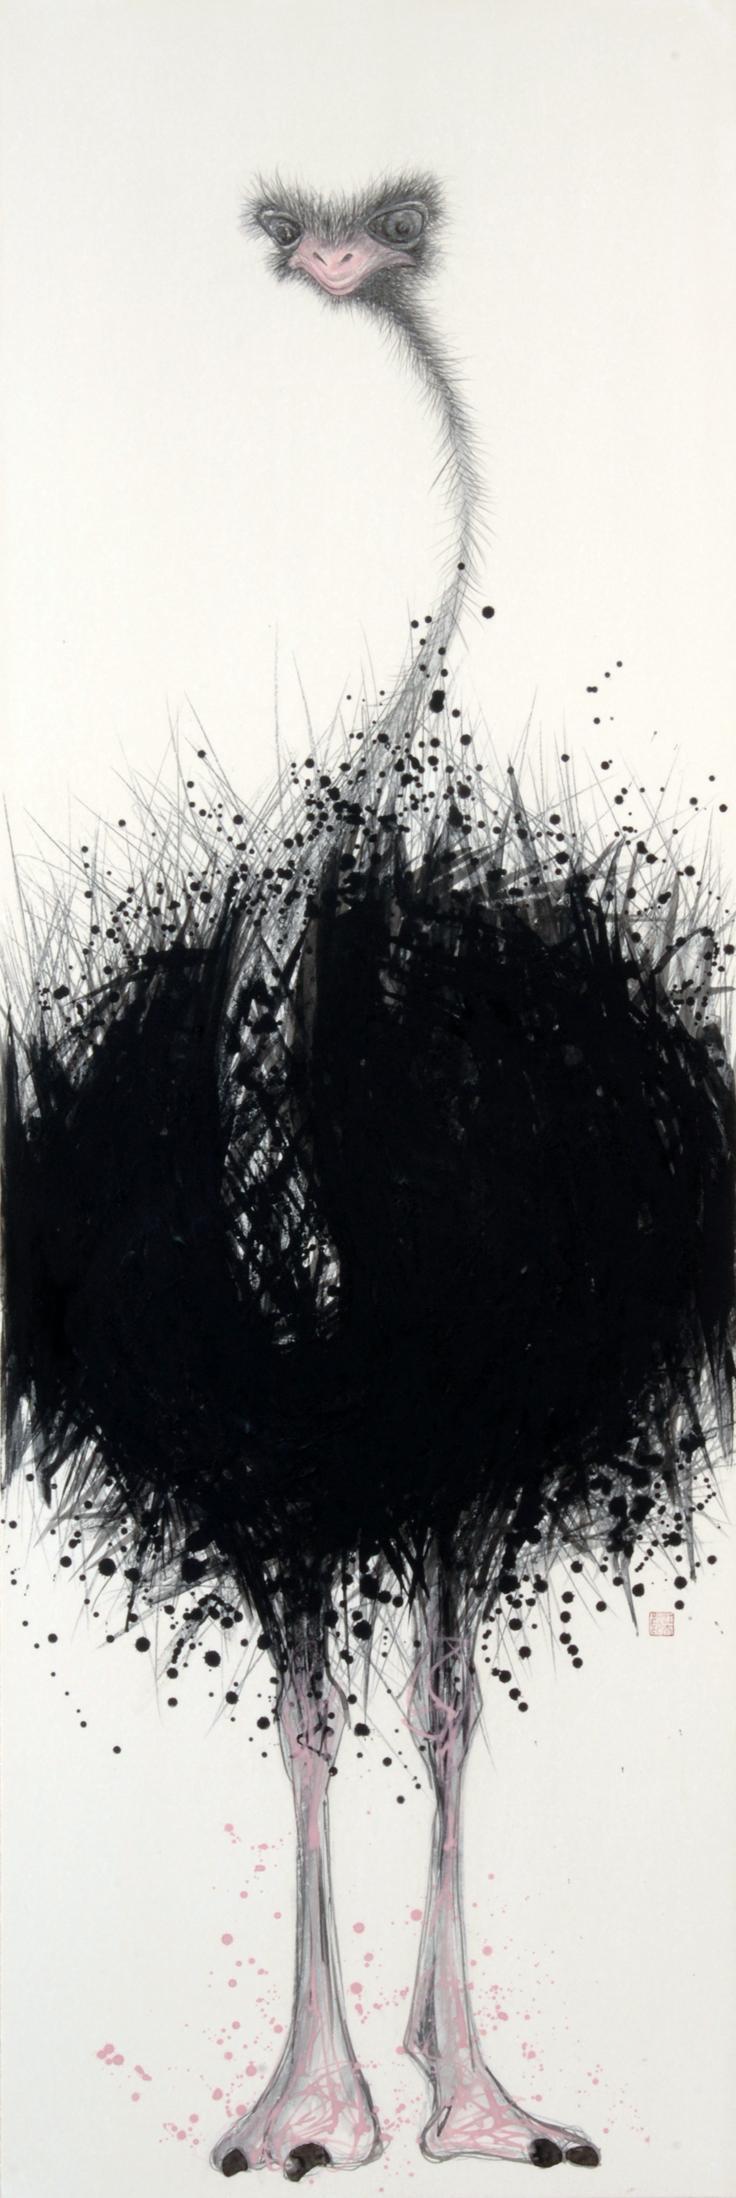 "Kotaro Fukui  Flightless #2, 2005  Japanese paper, Indian ink, Mineralpigment  58""x 19"""